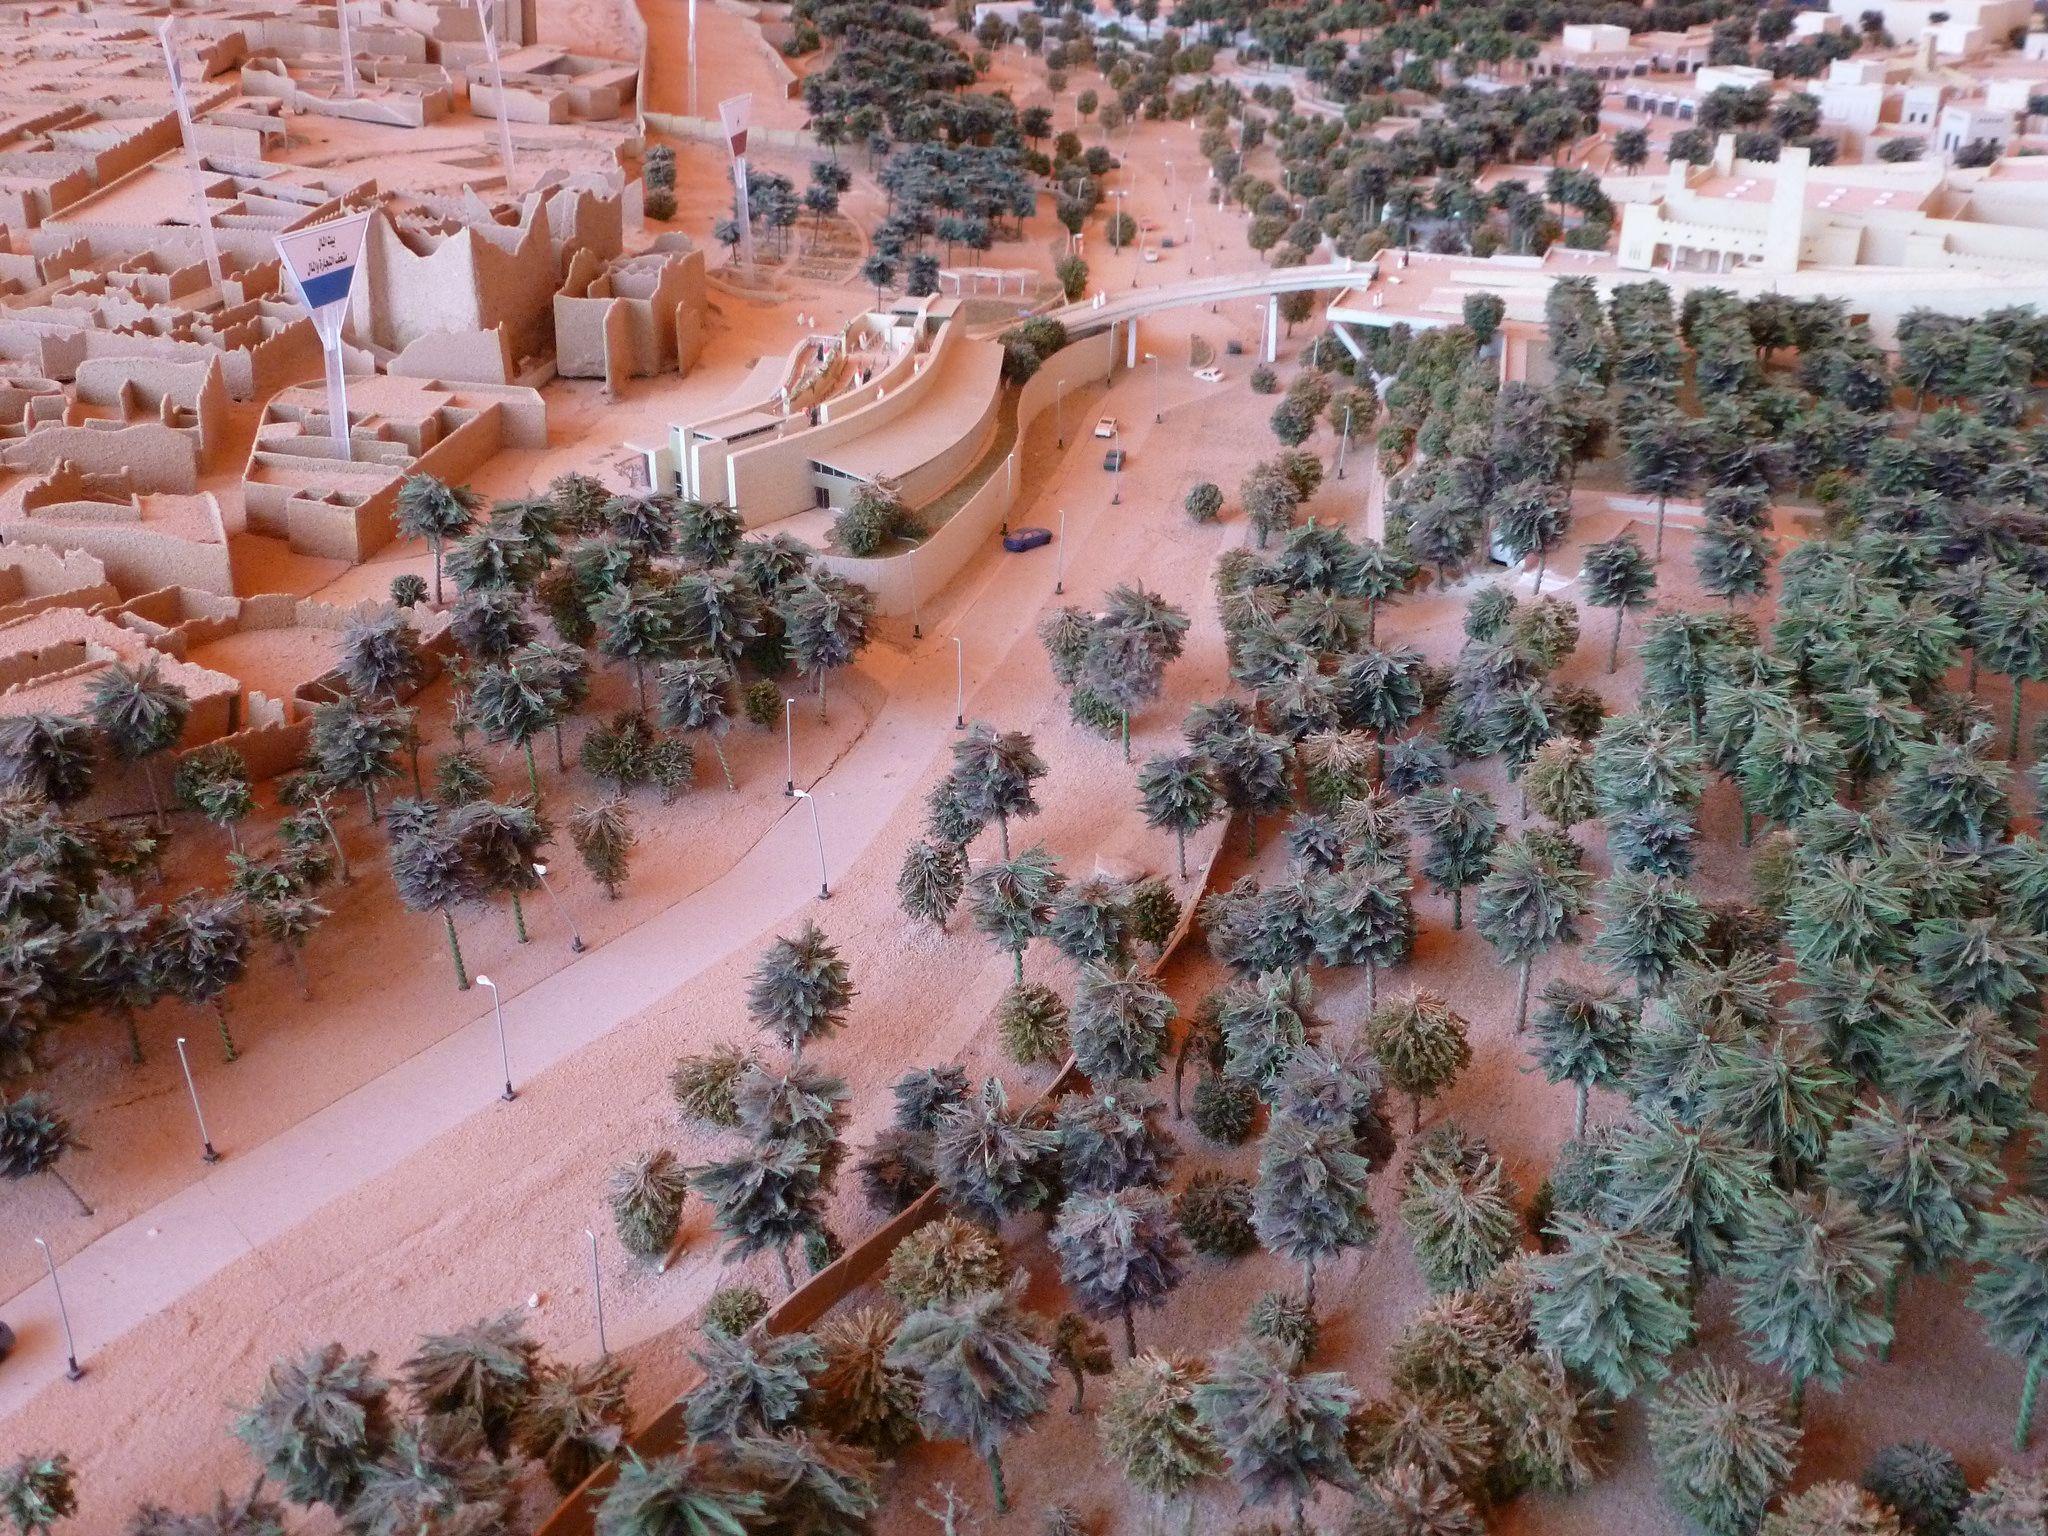 201404012 Saudi Arabia Diriyah Museum Islamic Heritage Saudi Arabia City Photo